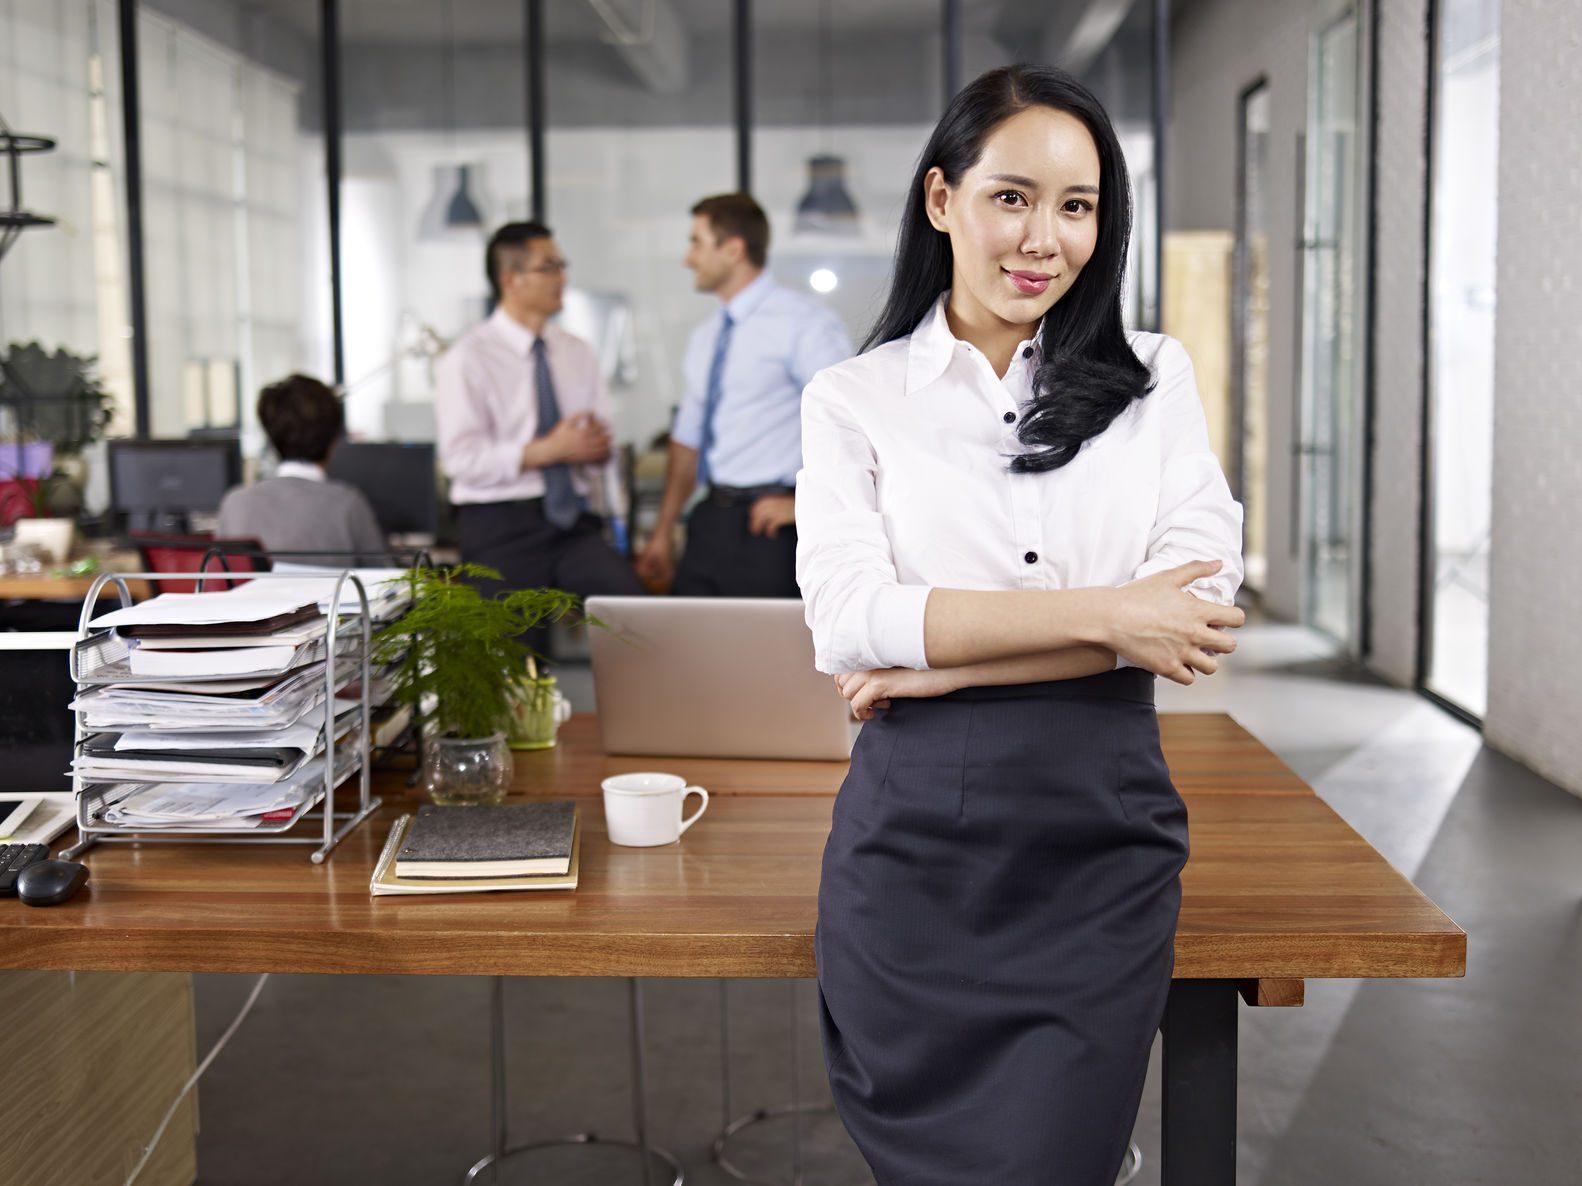 Top 17 Low-Stress High Paying Jobs